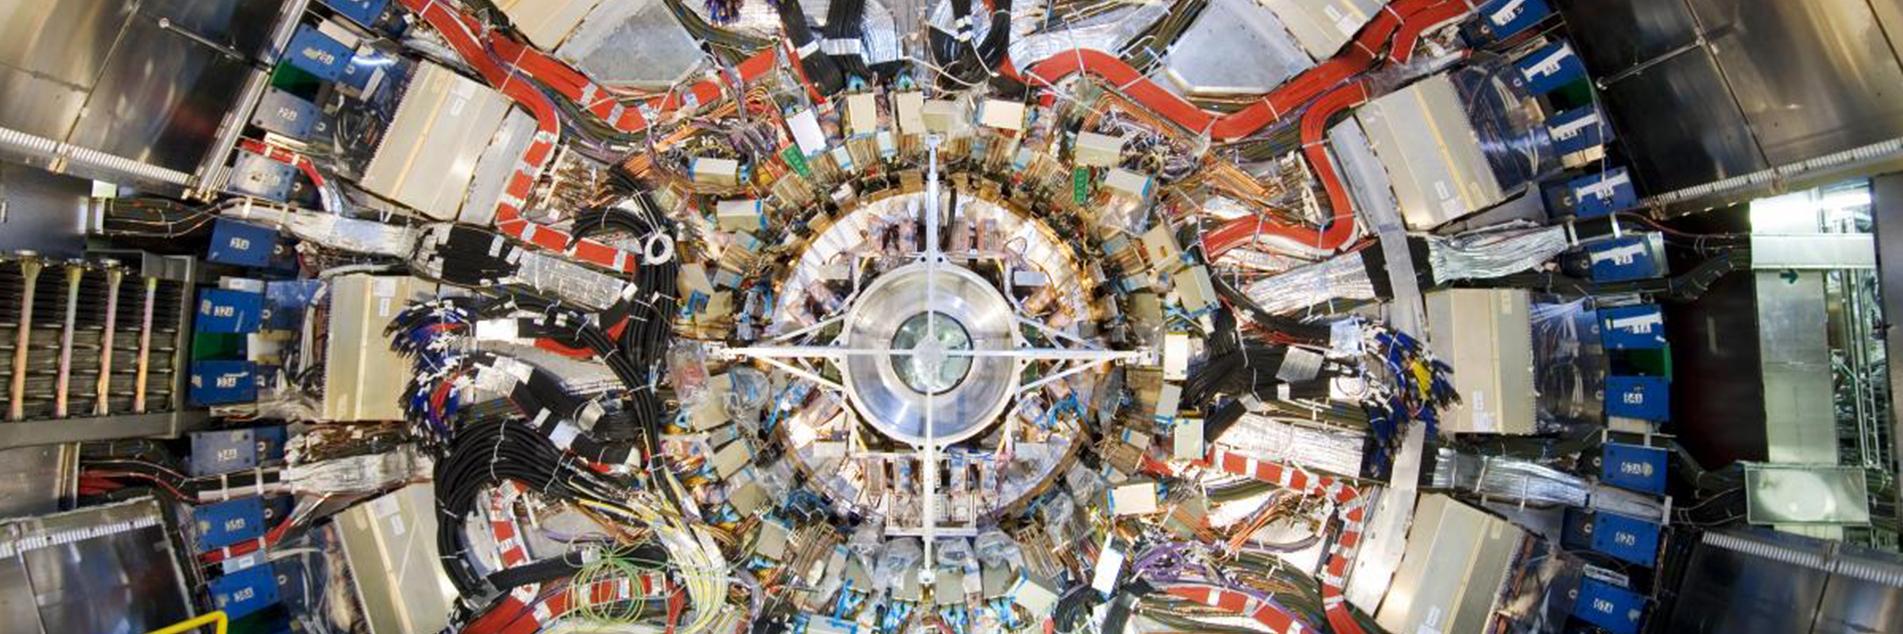 ATLAS detector at CERN. Photo: CERN.